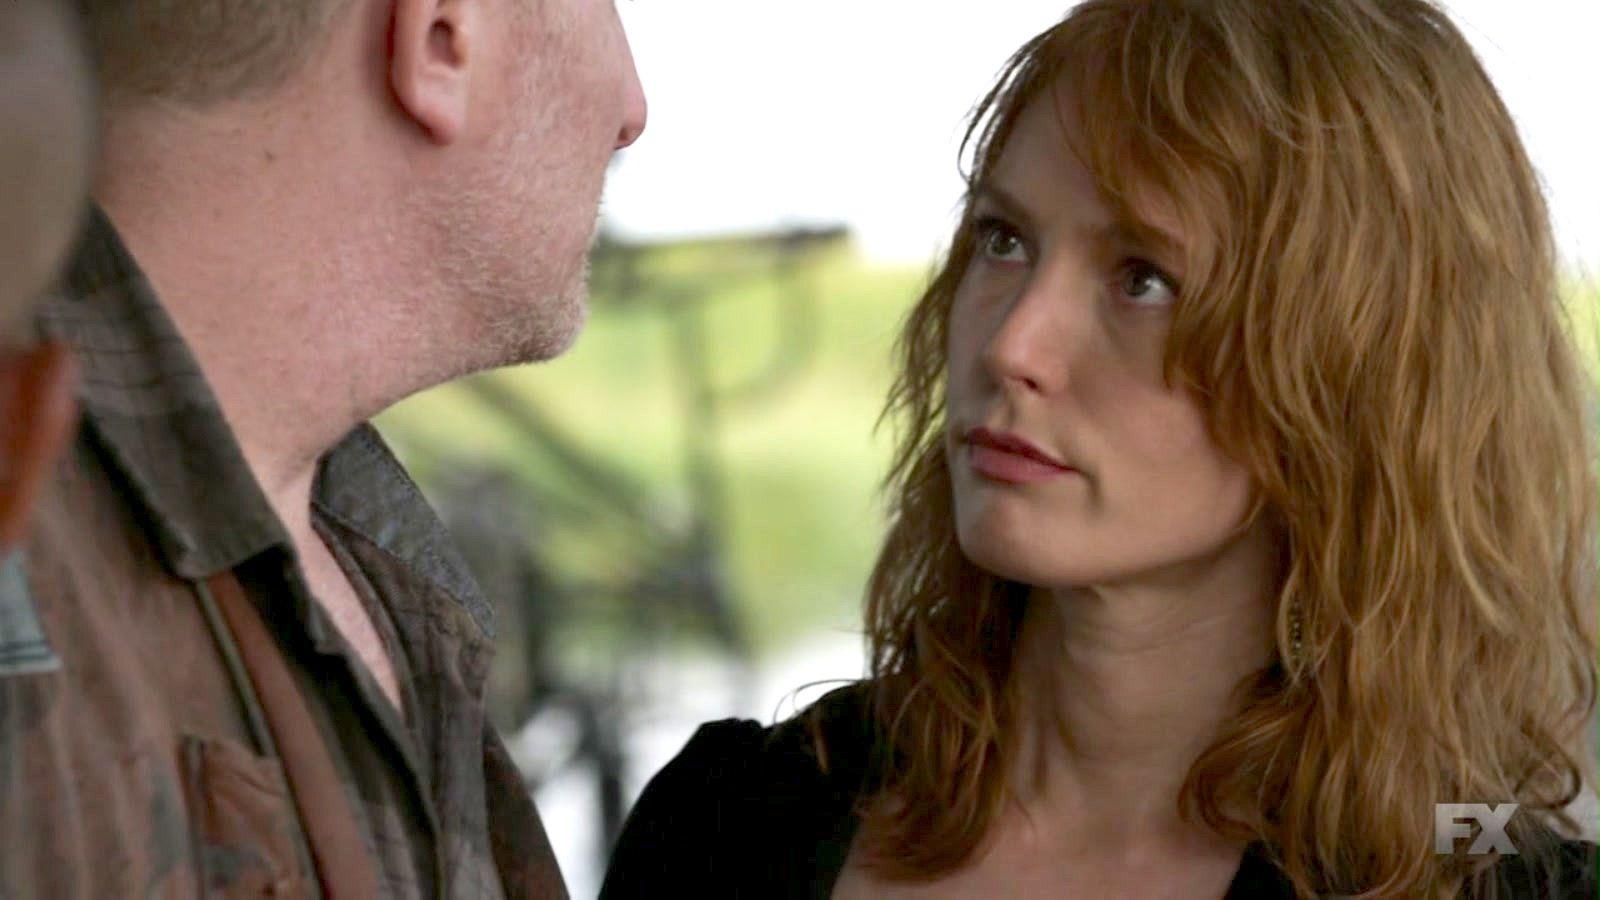 Michael rapaport as daryl crowe jr and alicia witt as - Daryl crowe jr ...